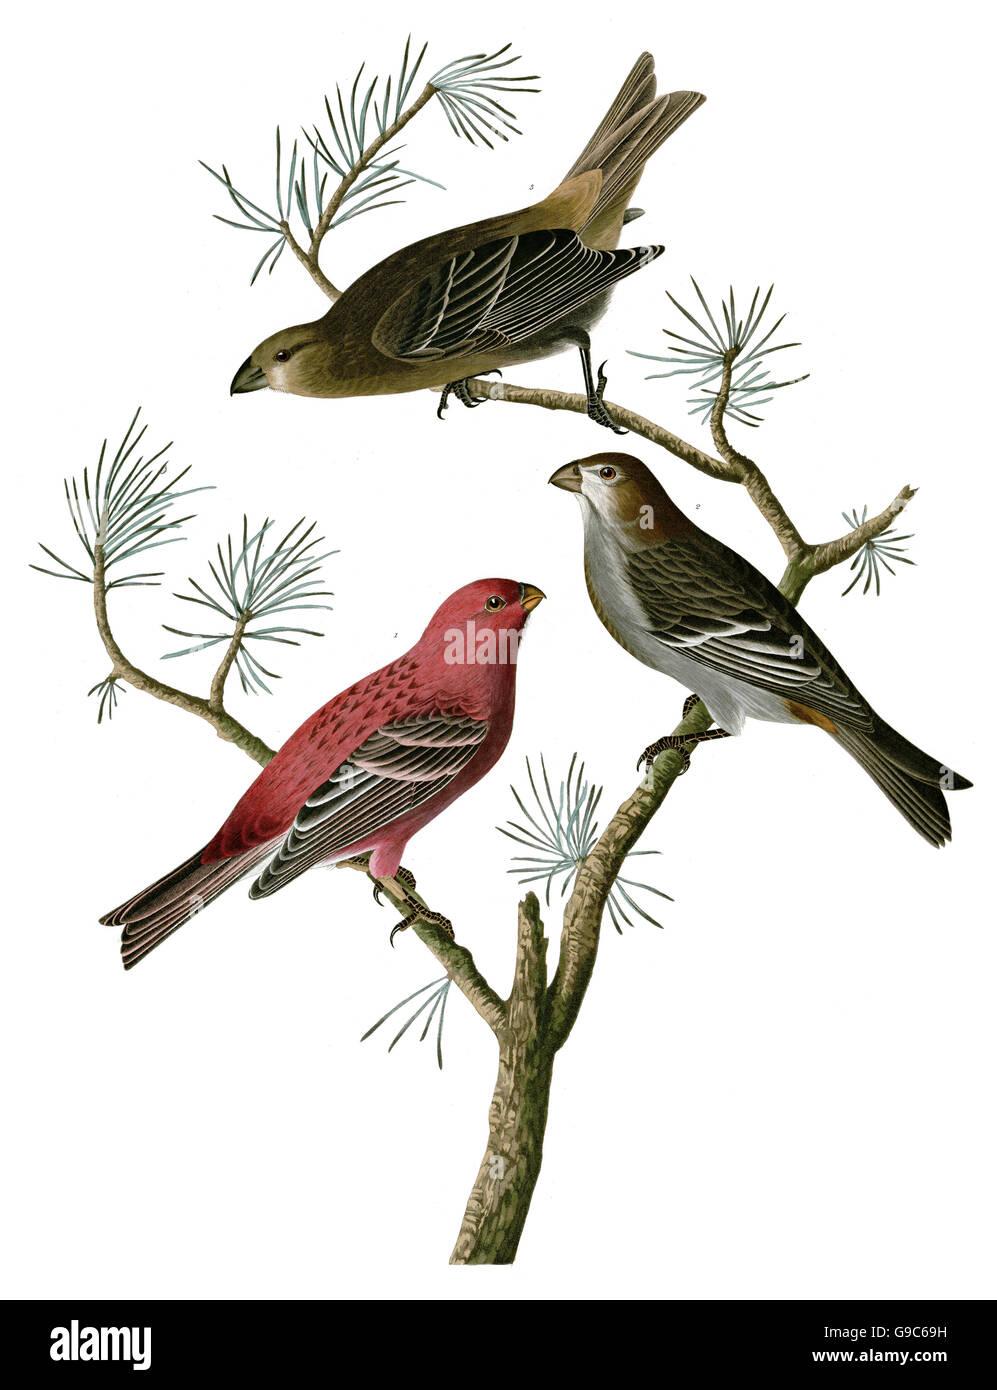 Pine Grosbeak, Pinicola enucleator, birds, 1827 - 1838 - Stock Image